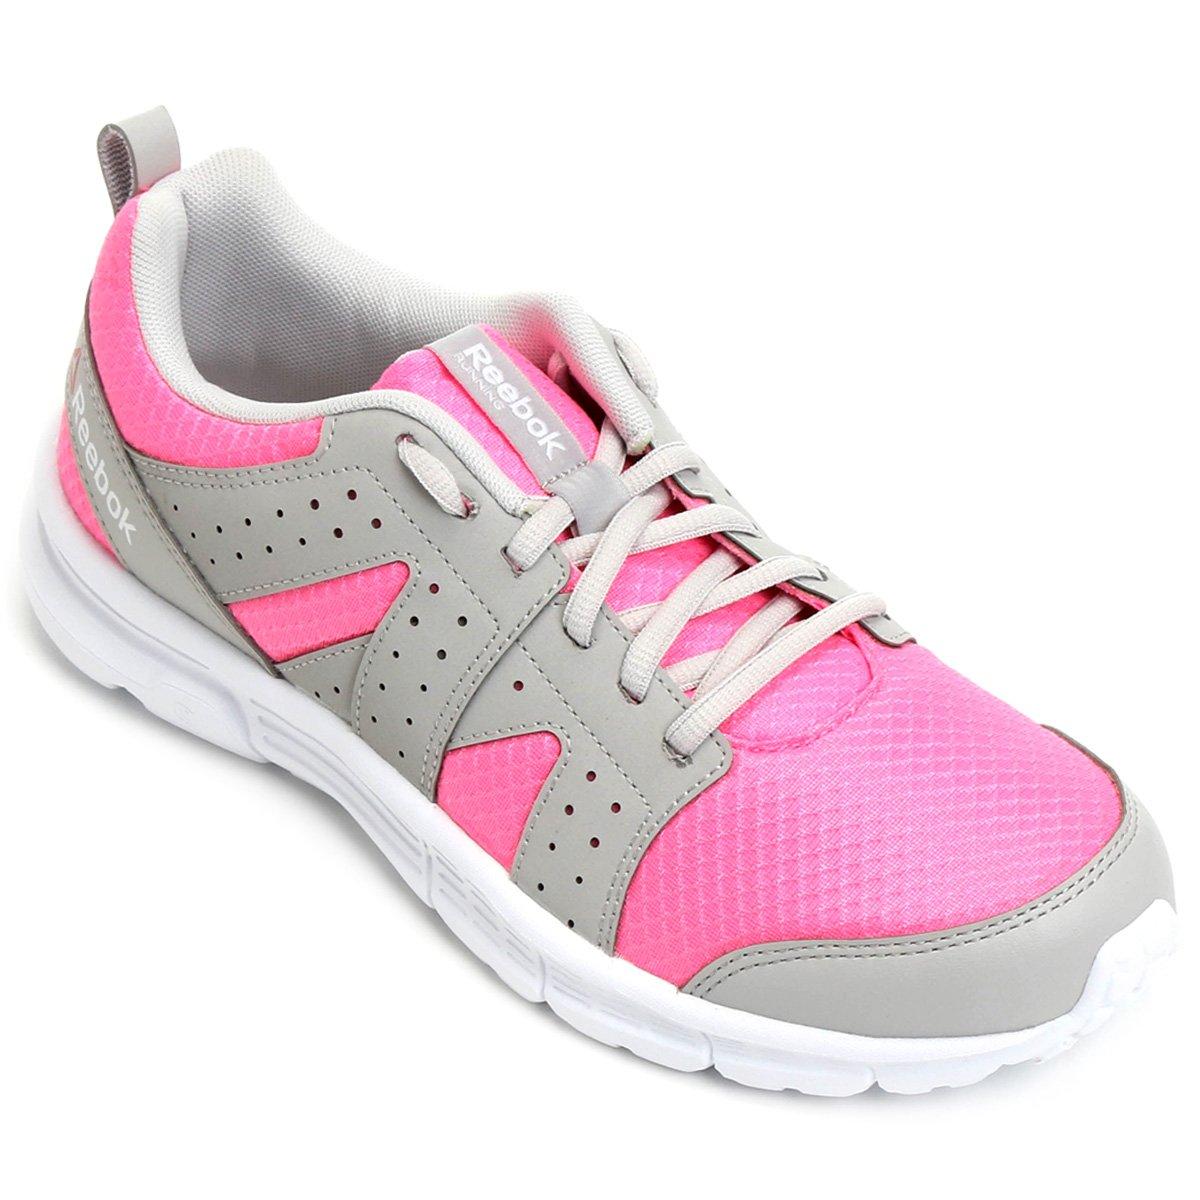 38a6cd3e411 Tênis Reebok Rise Supreme RG Feminino - Pink e Cinza - Compre Agora ...